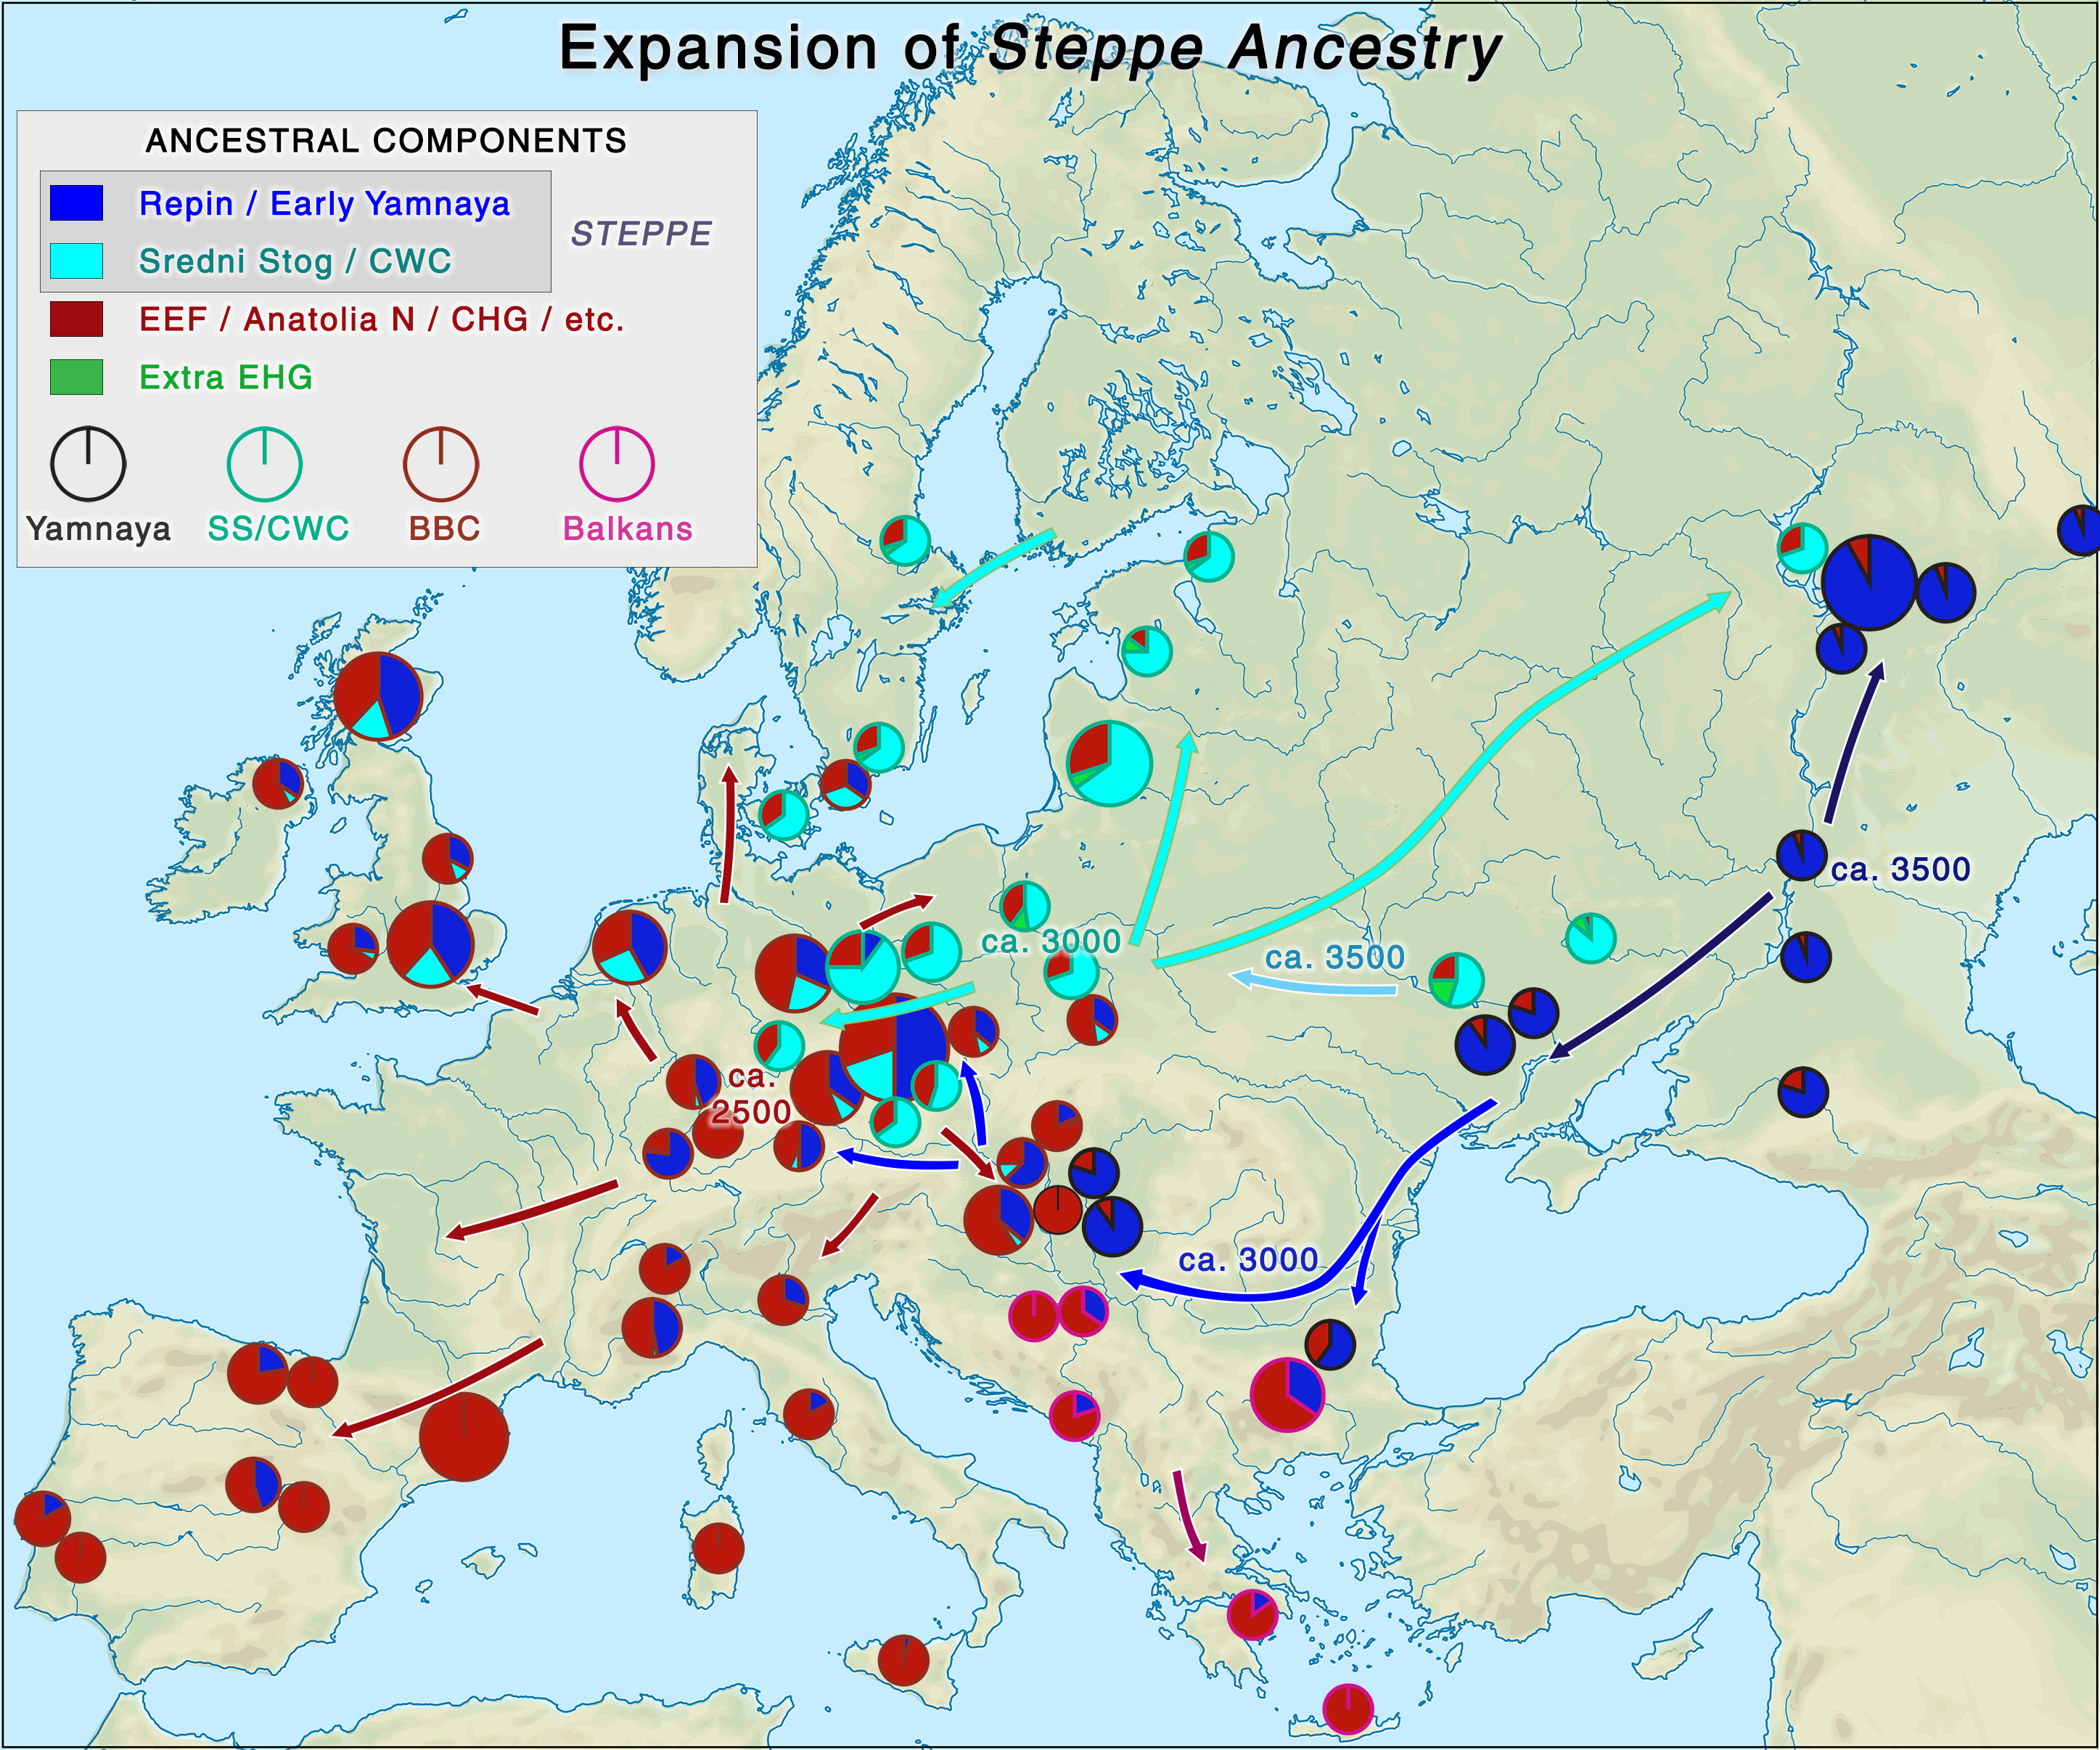 Yamnaya steppe ancestry